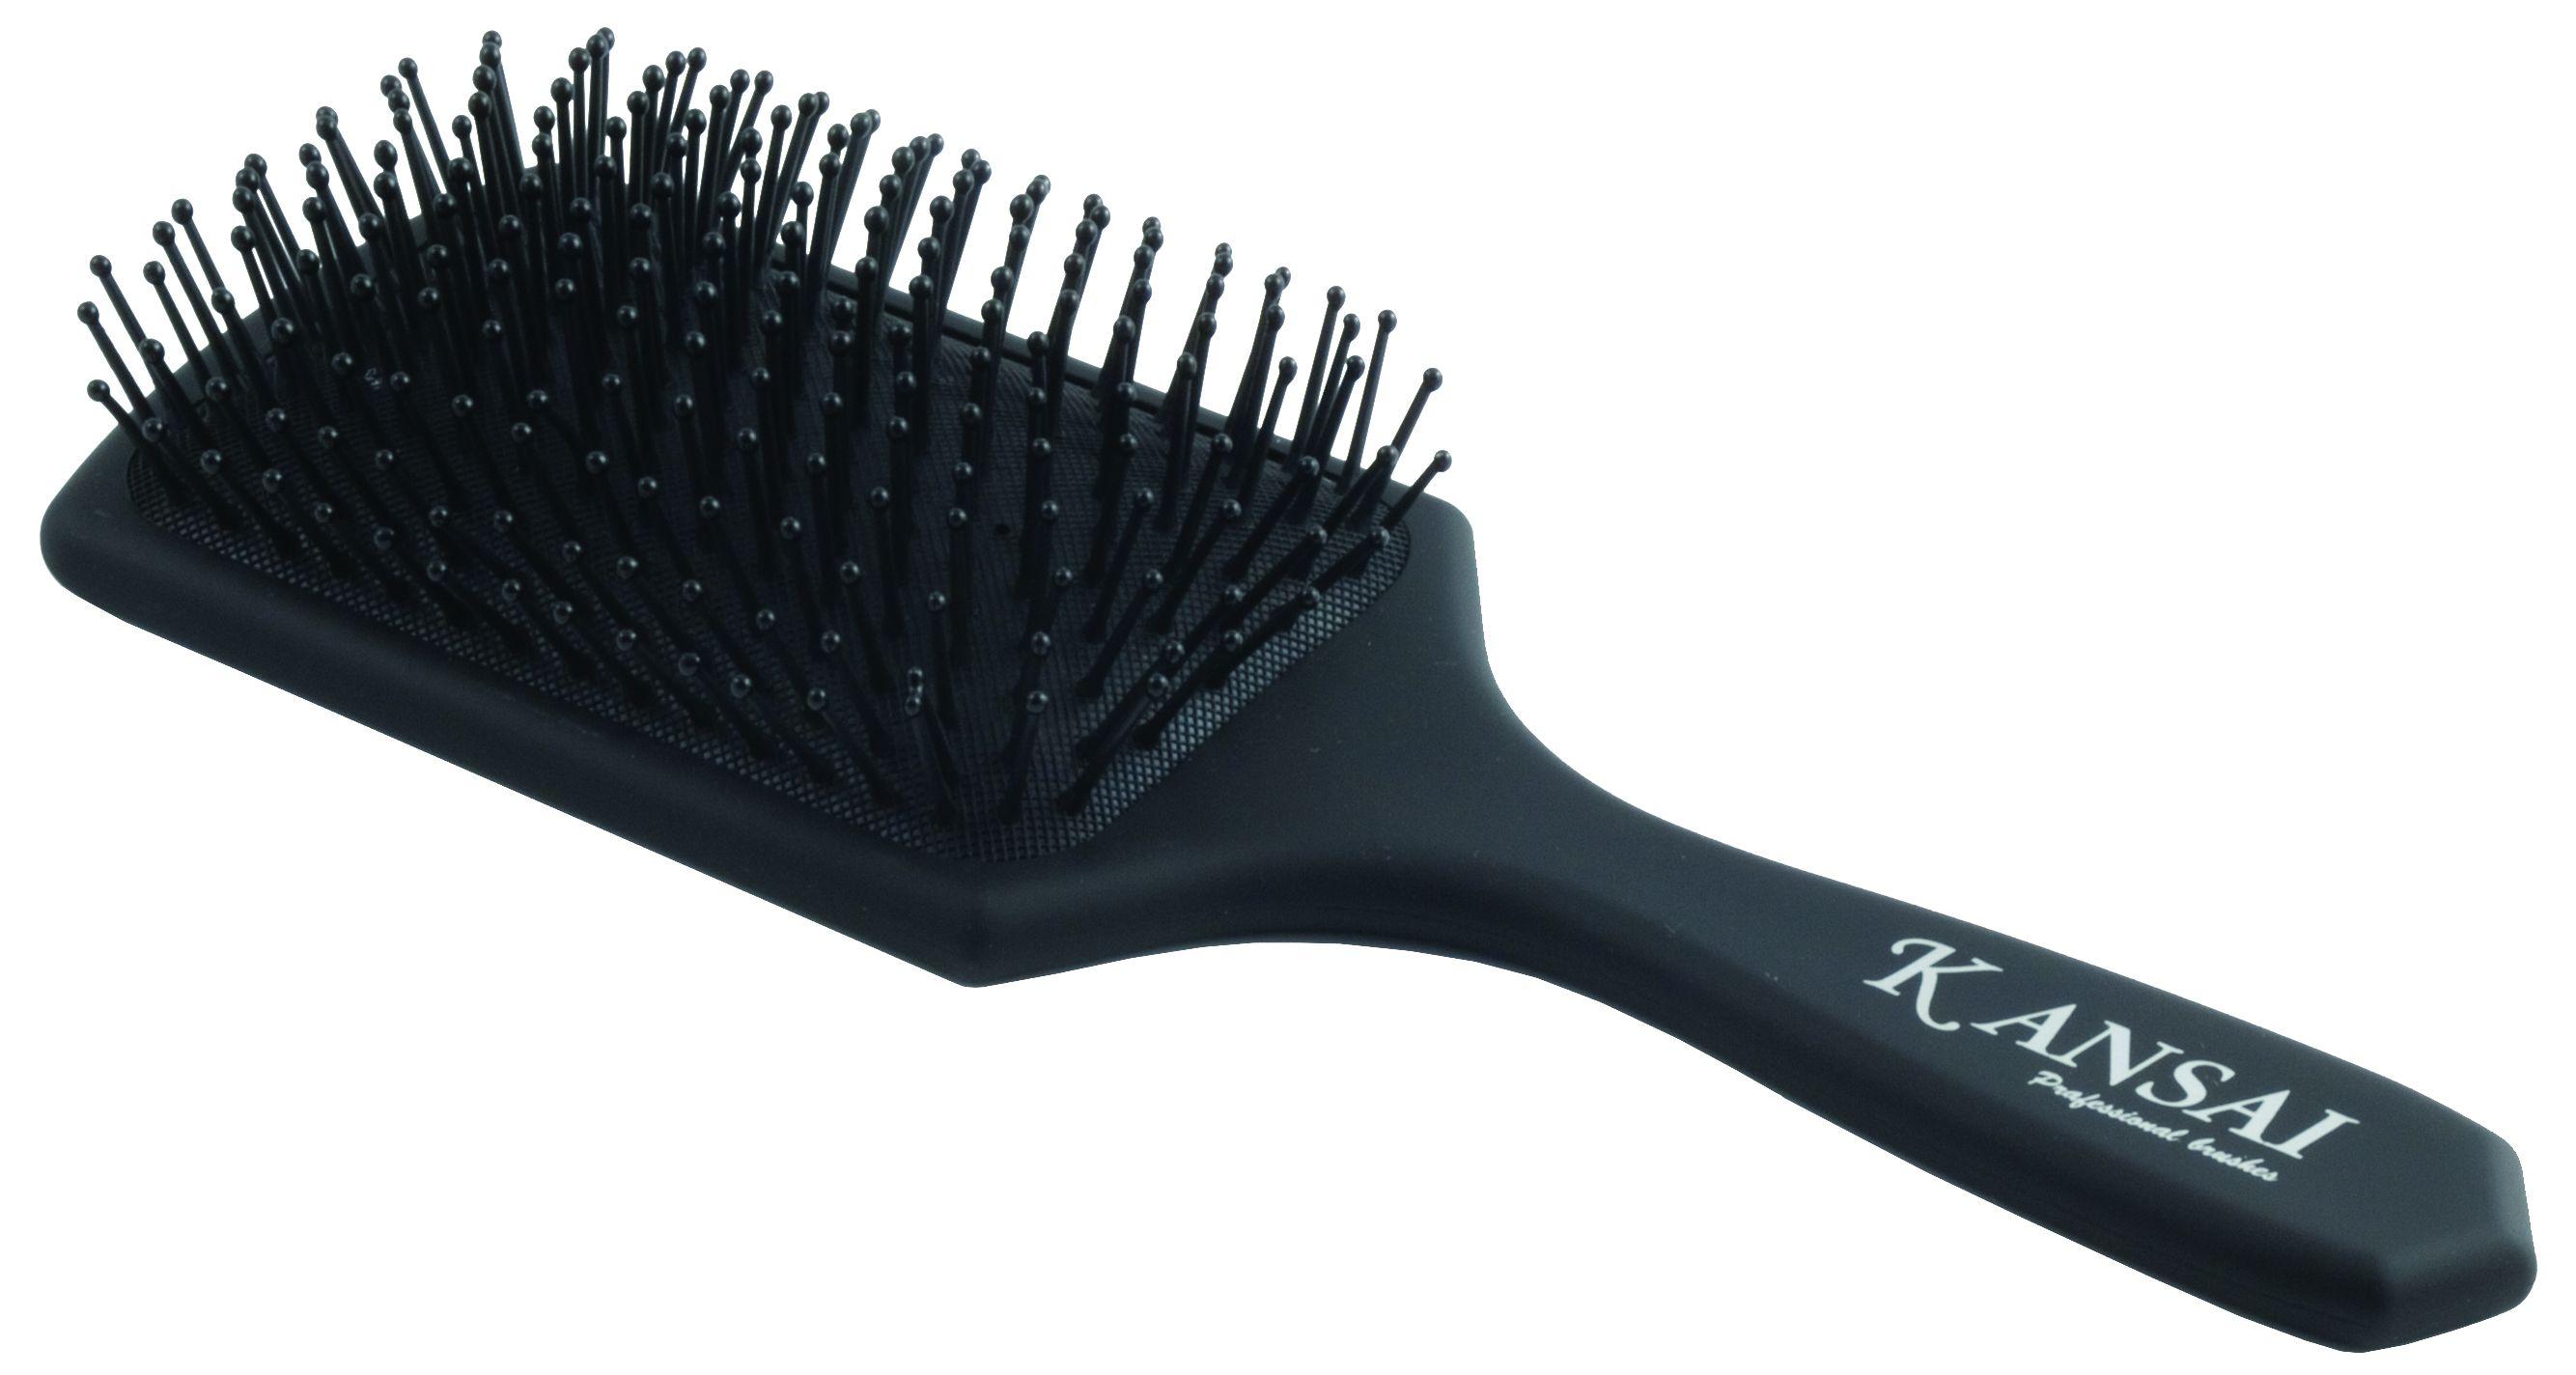 KANSAI P20 Paddle Brush schwarz